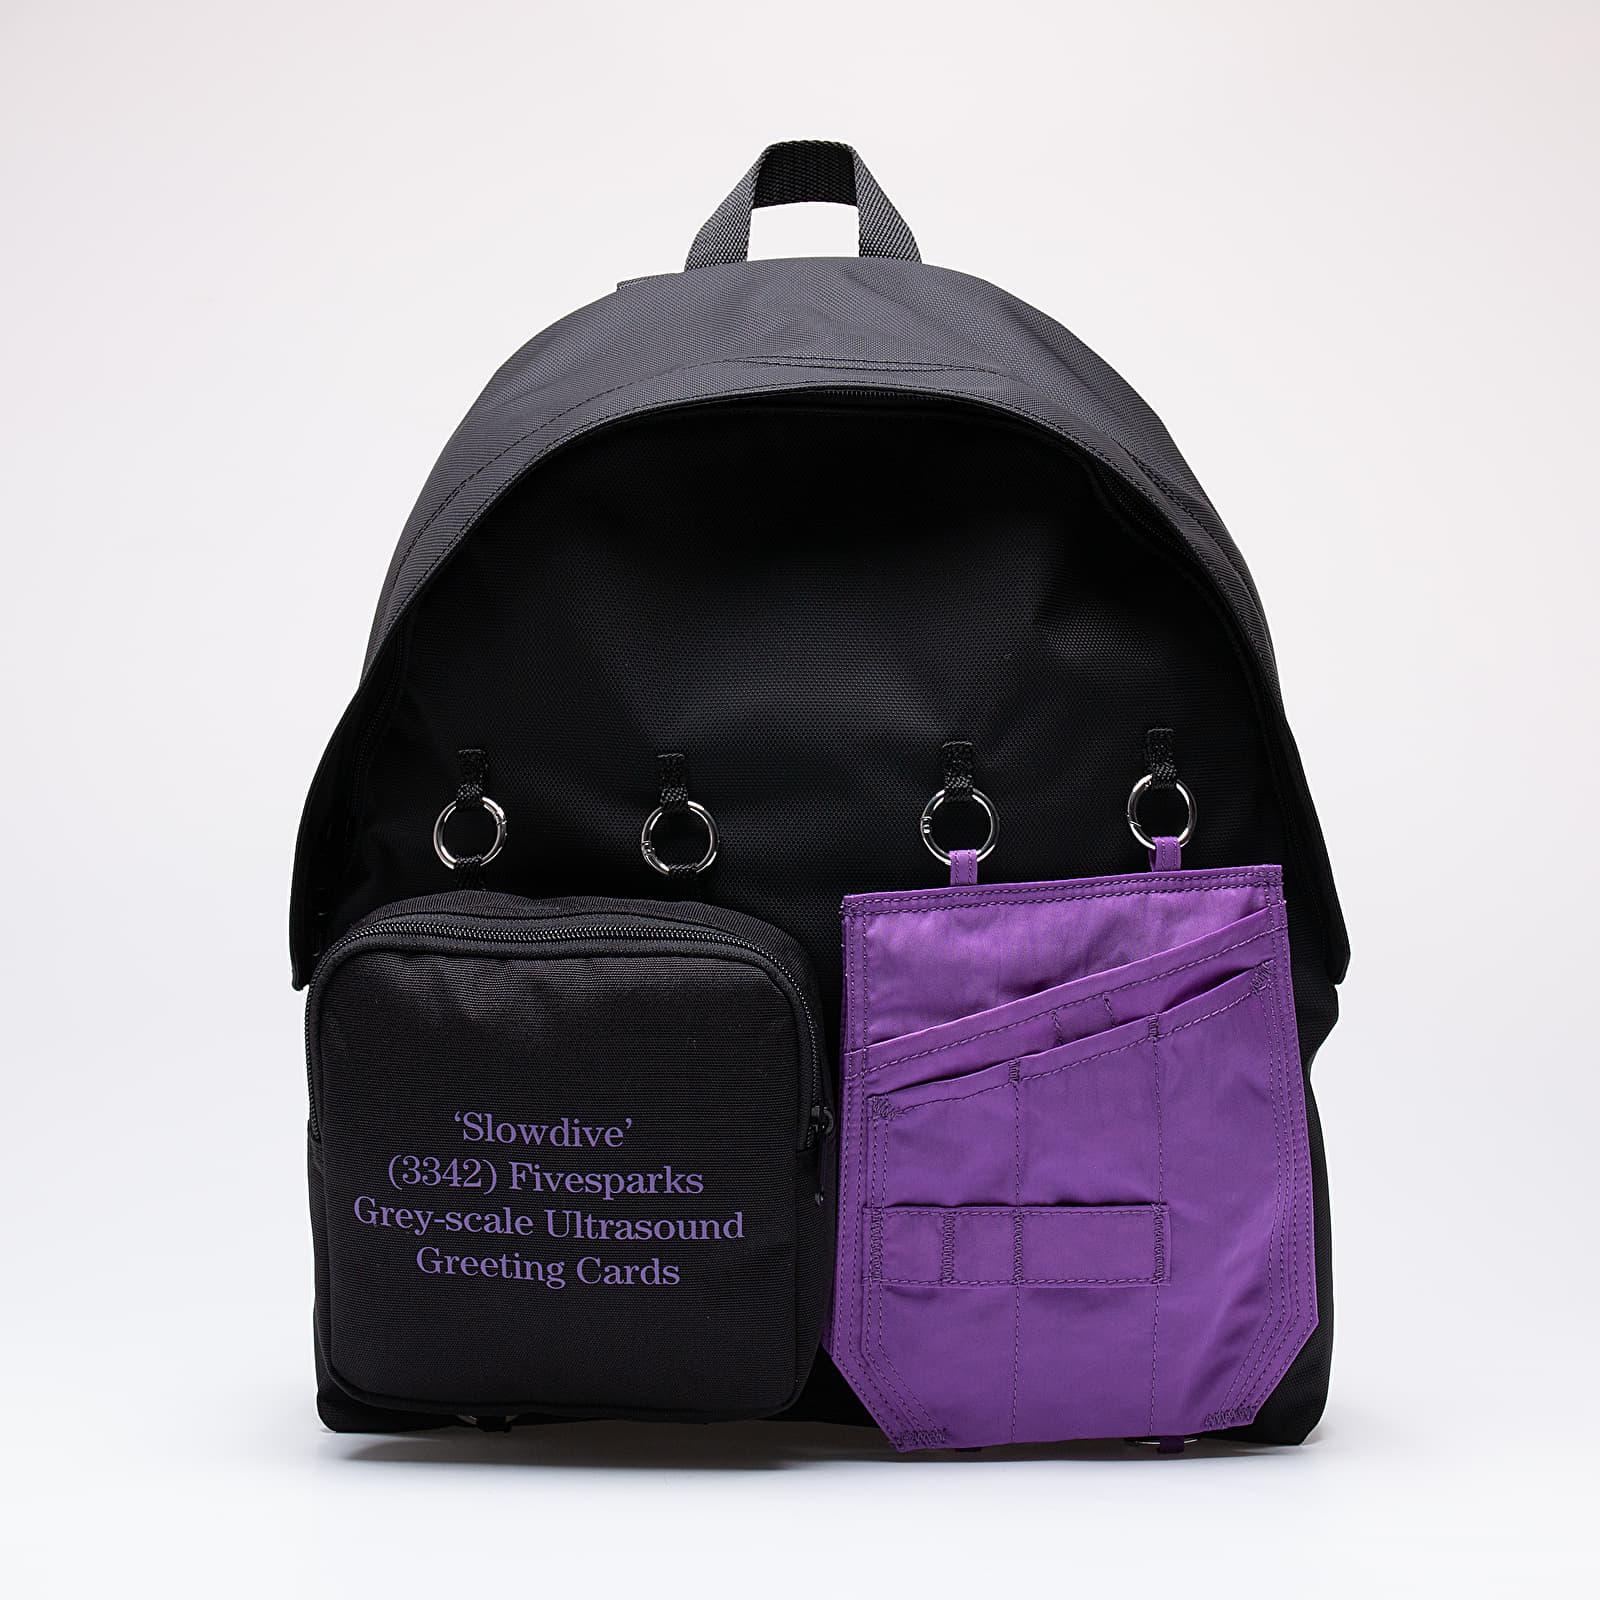 Batohy a tašky Eastpak x Raf Simons Padded Doubl'r Raf Simons Purple Quote